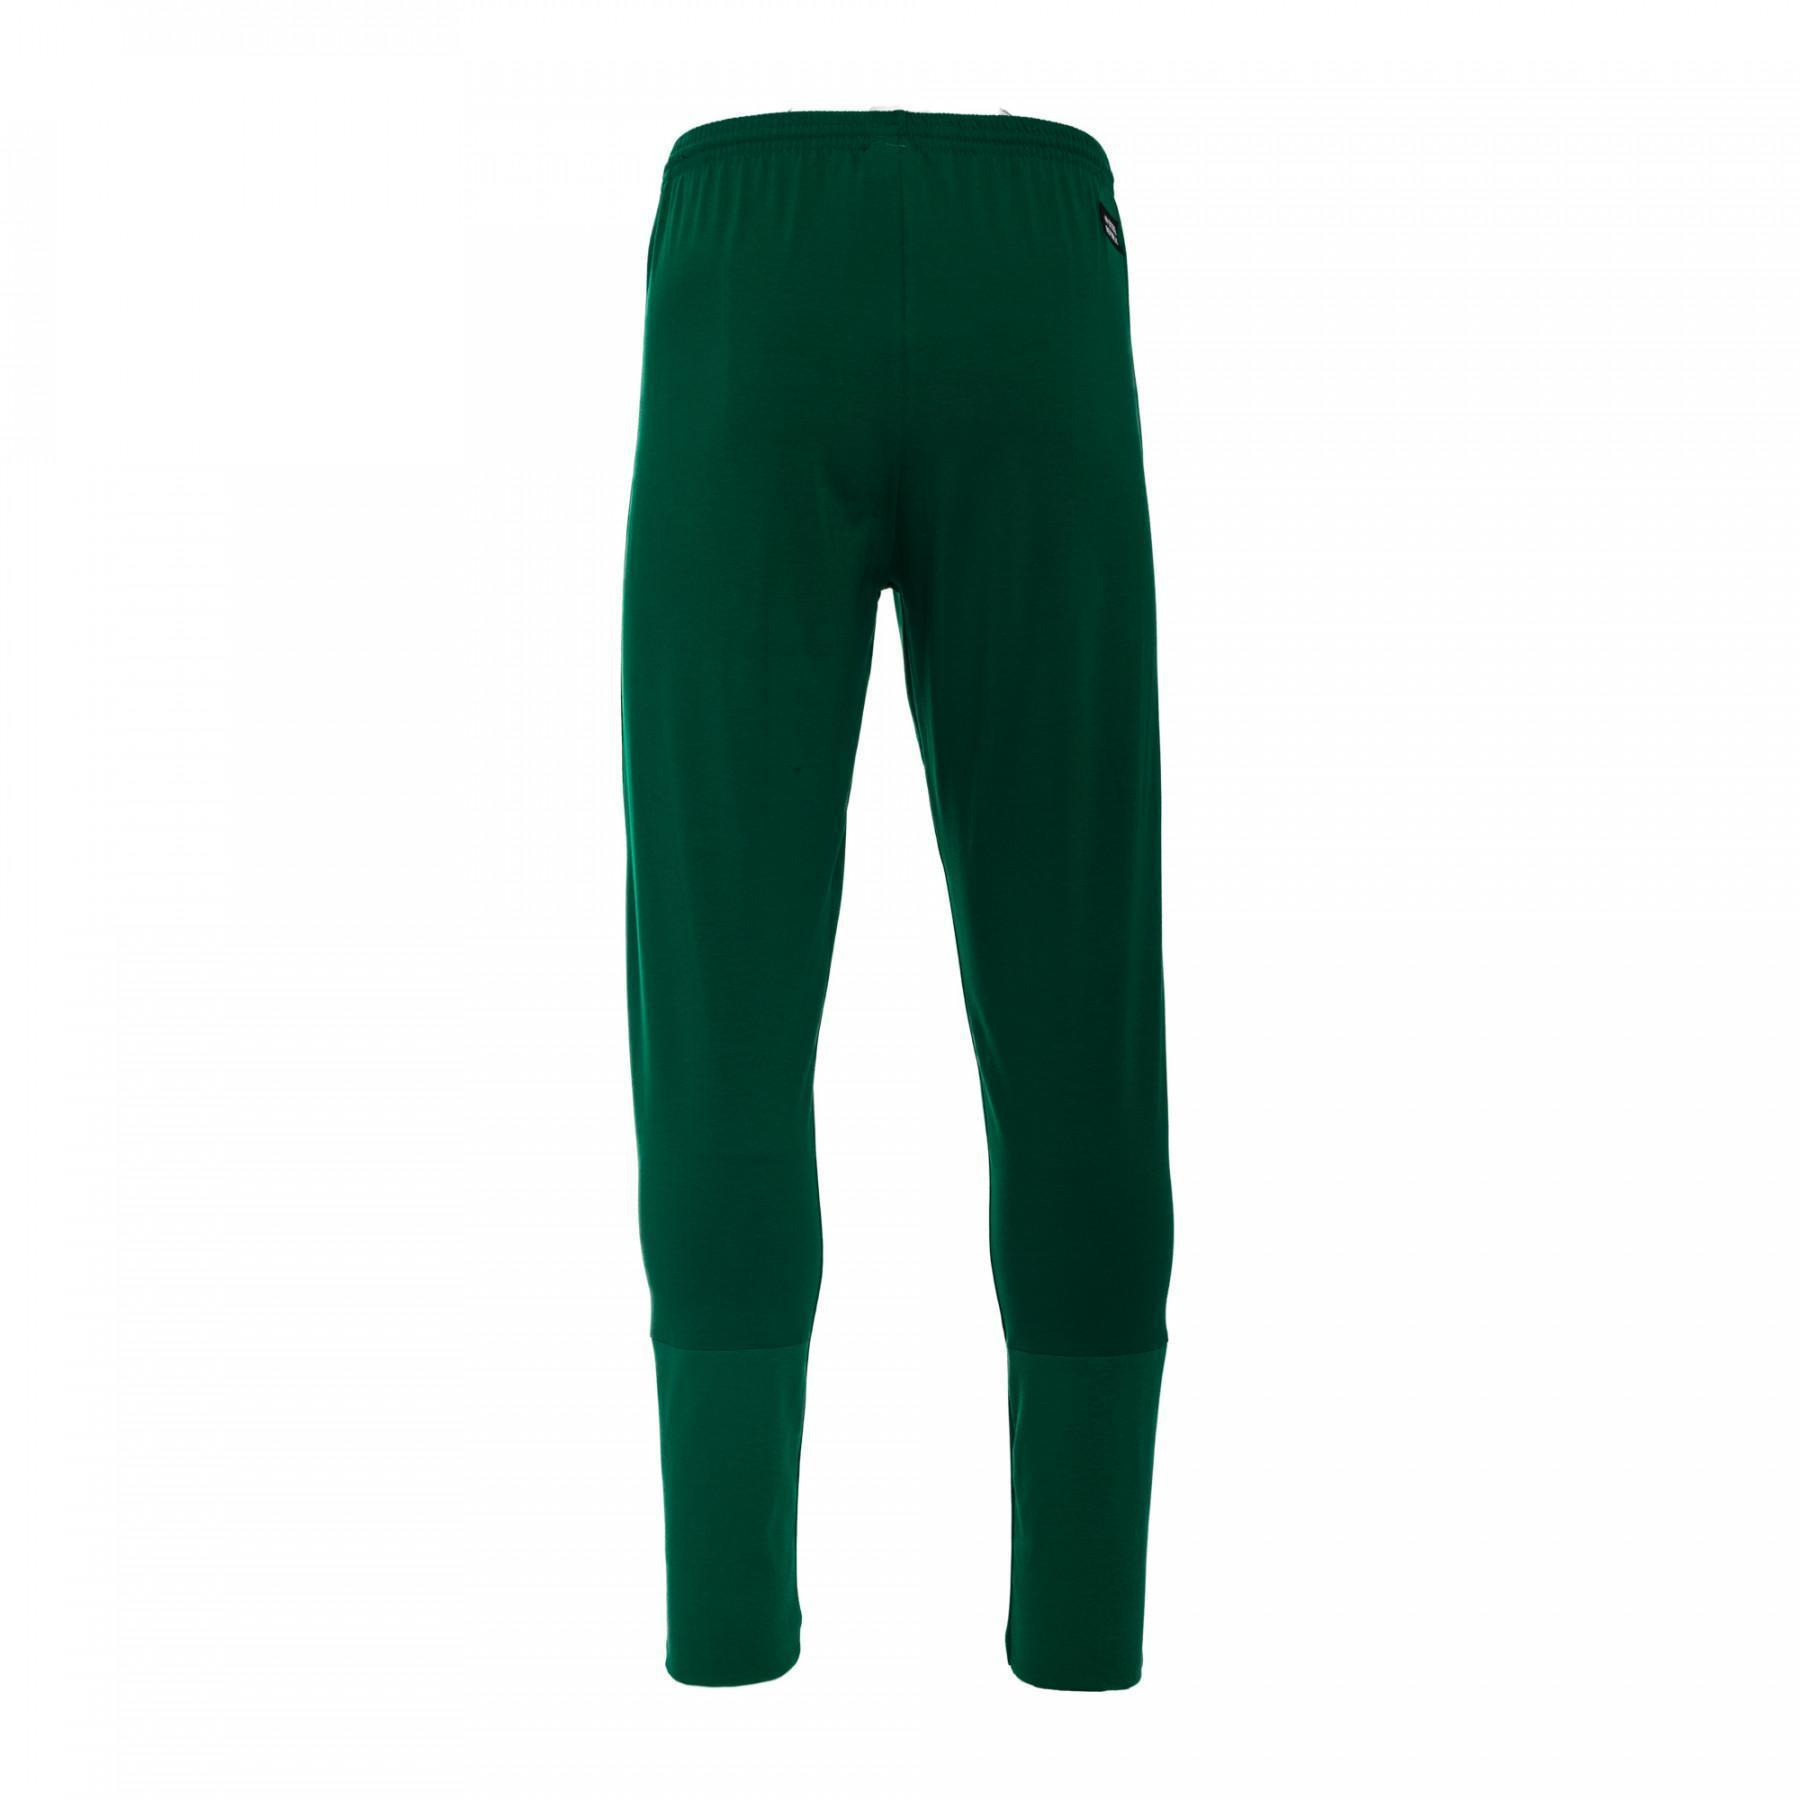 Trousers Errea essential drake ad